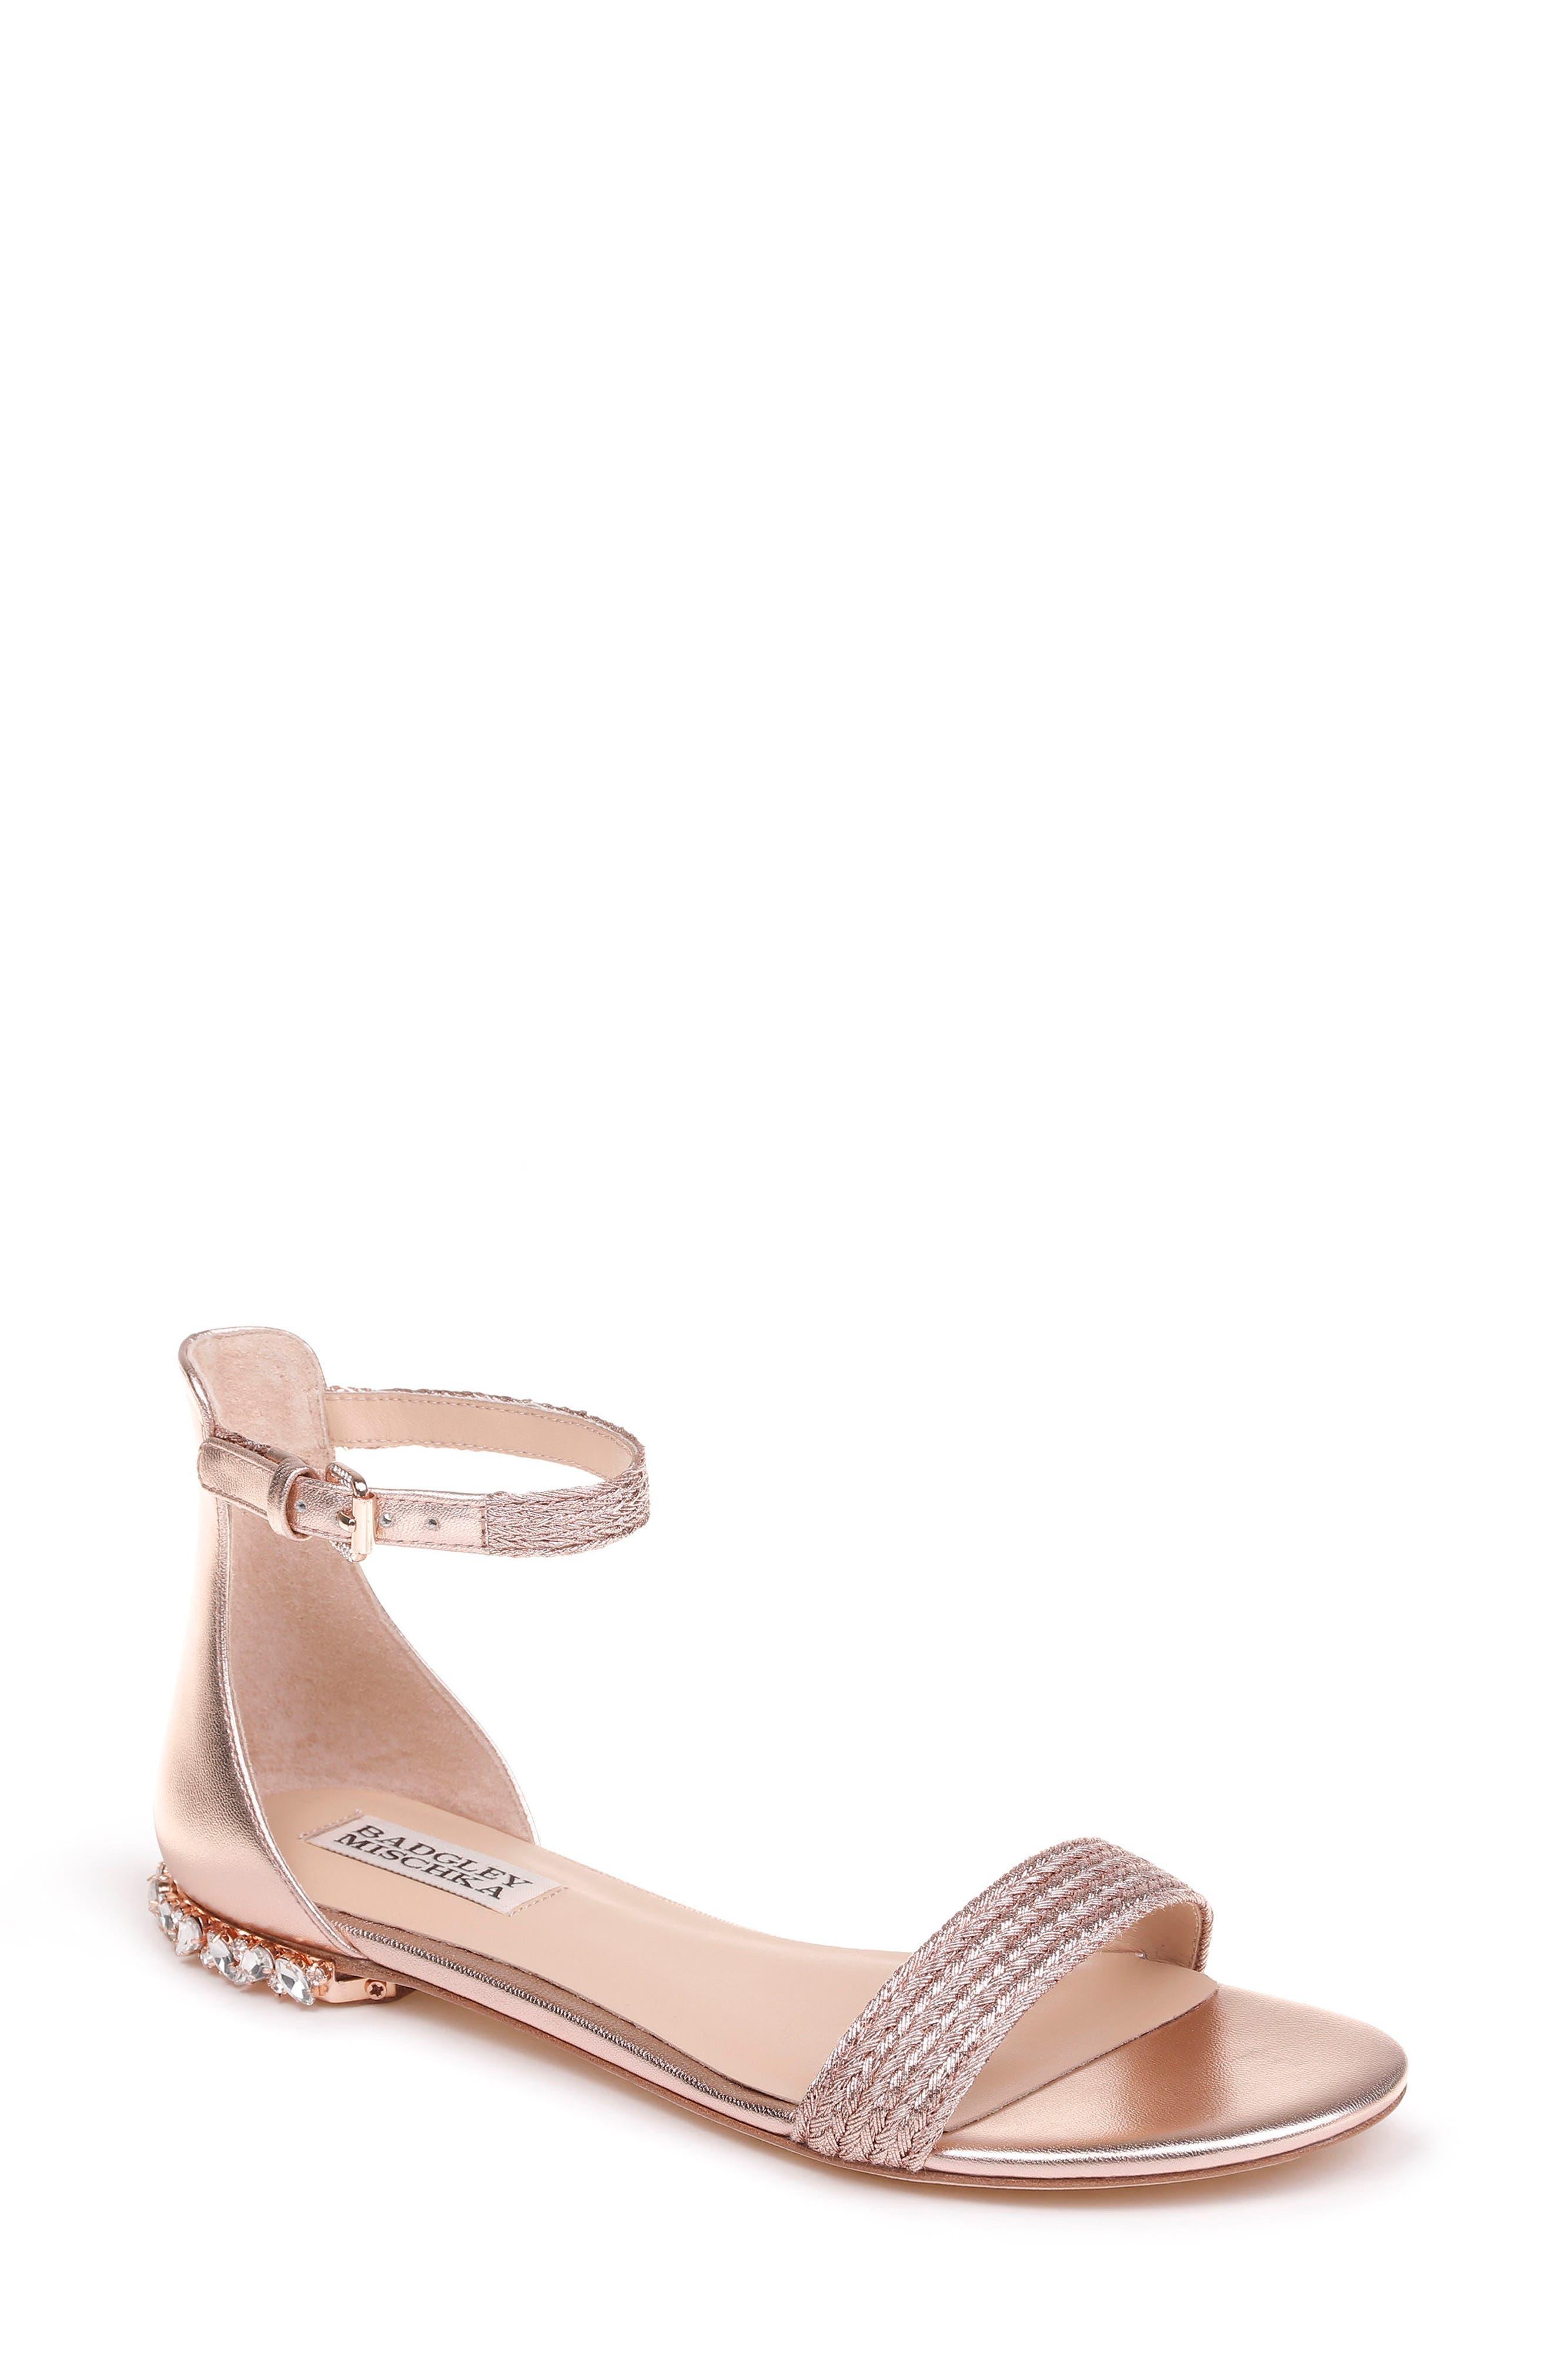 Steffie Ankle Strap Sandal,                             Main thumbnail 1, color,                             ROSE GOLD LEATHER